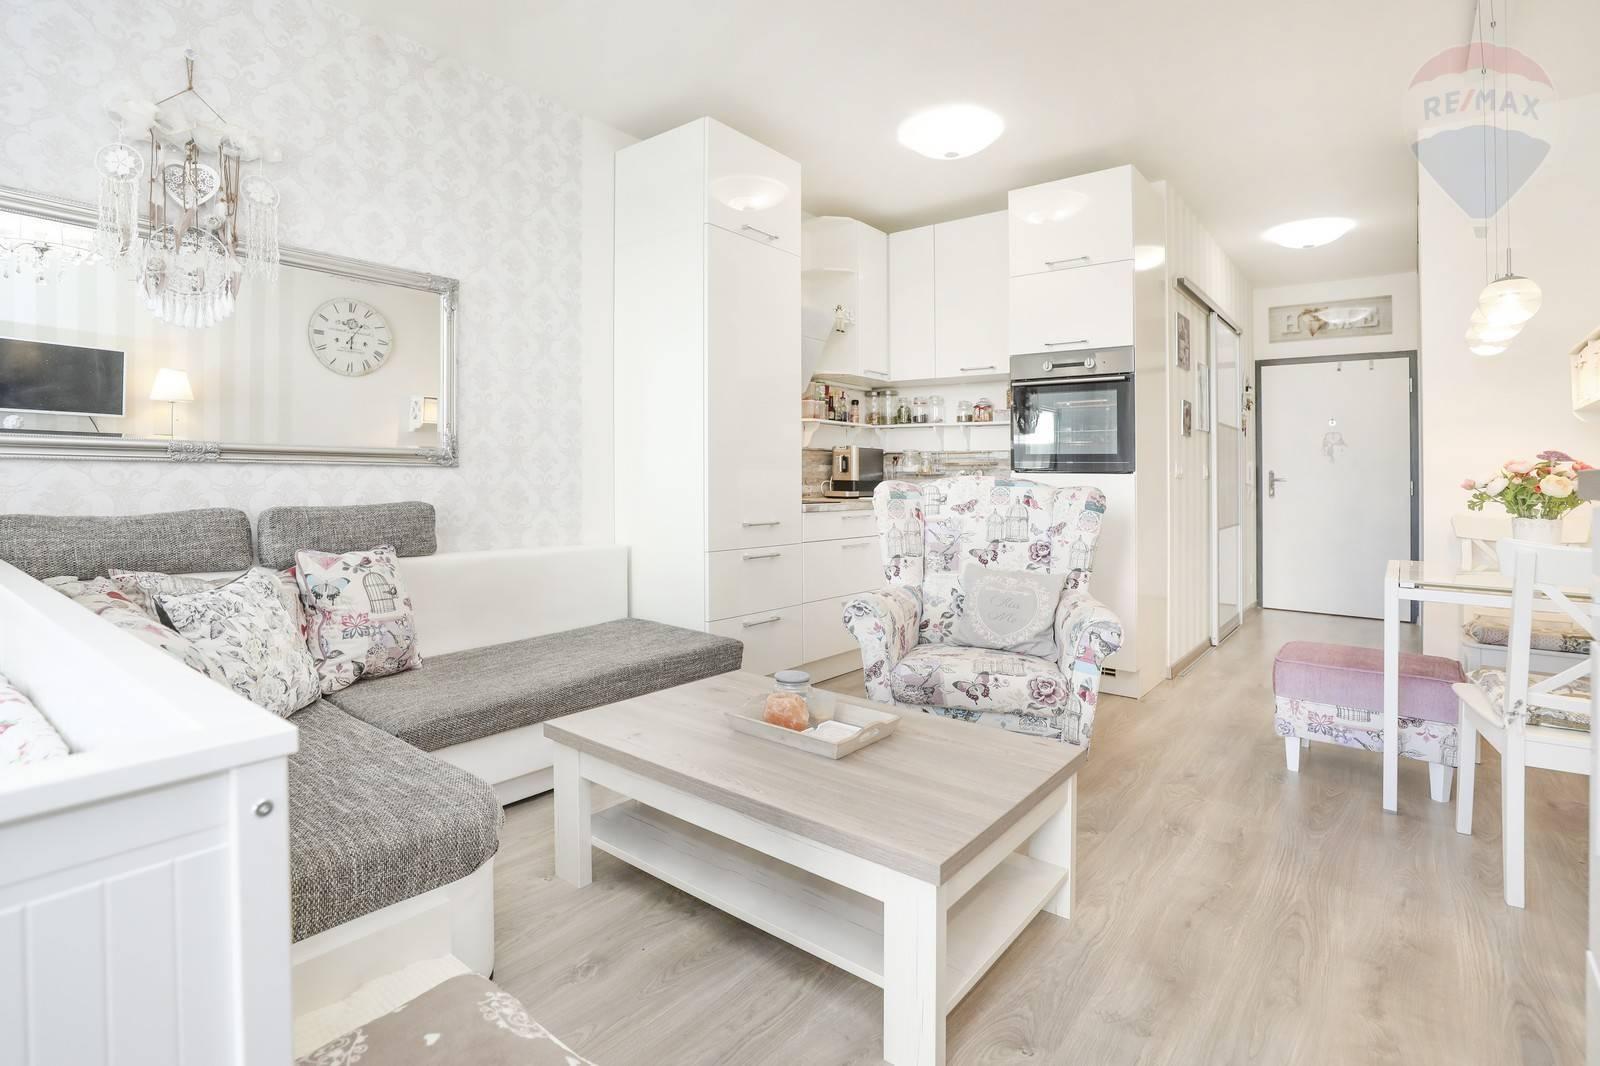 Predaj 1 -izbového bytu ( 33 m2 ) Petržalka- Slnečnice